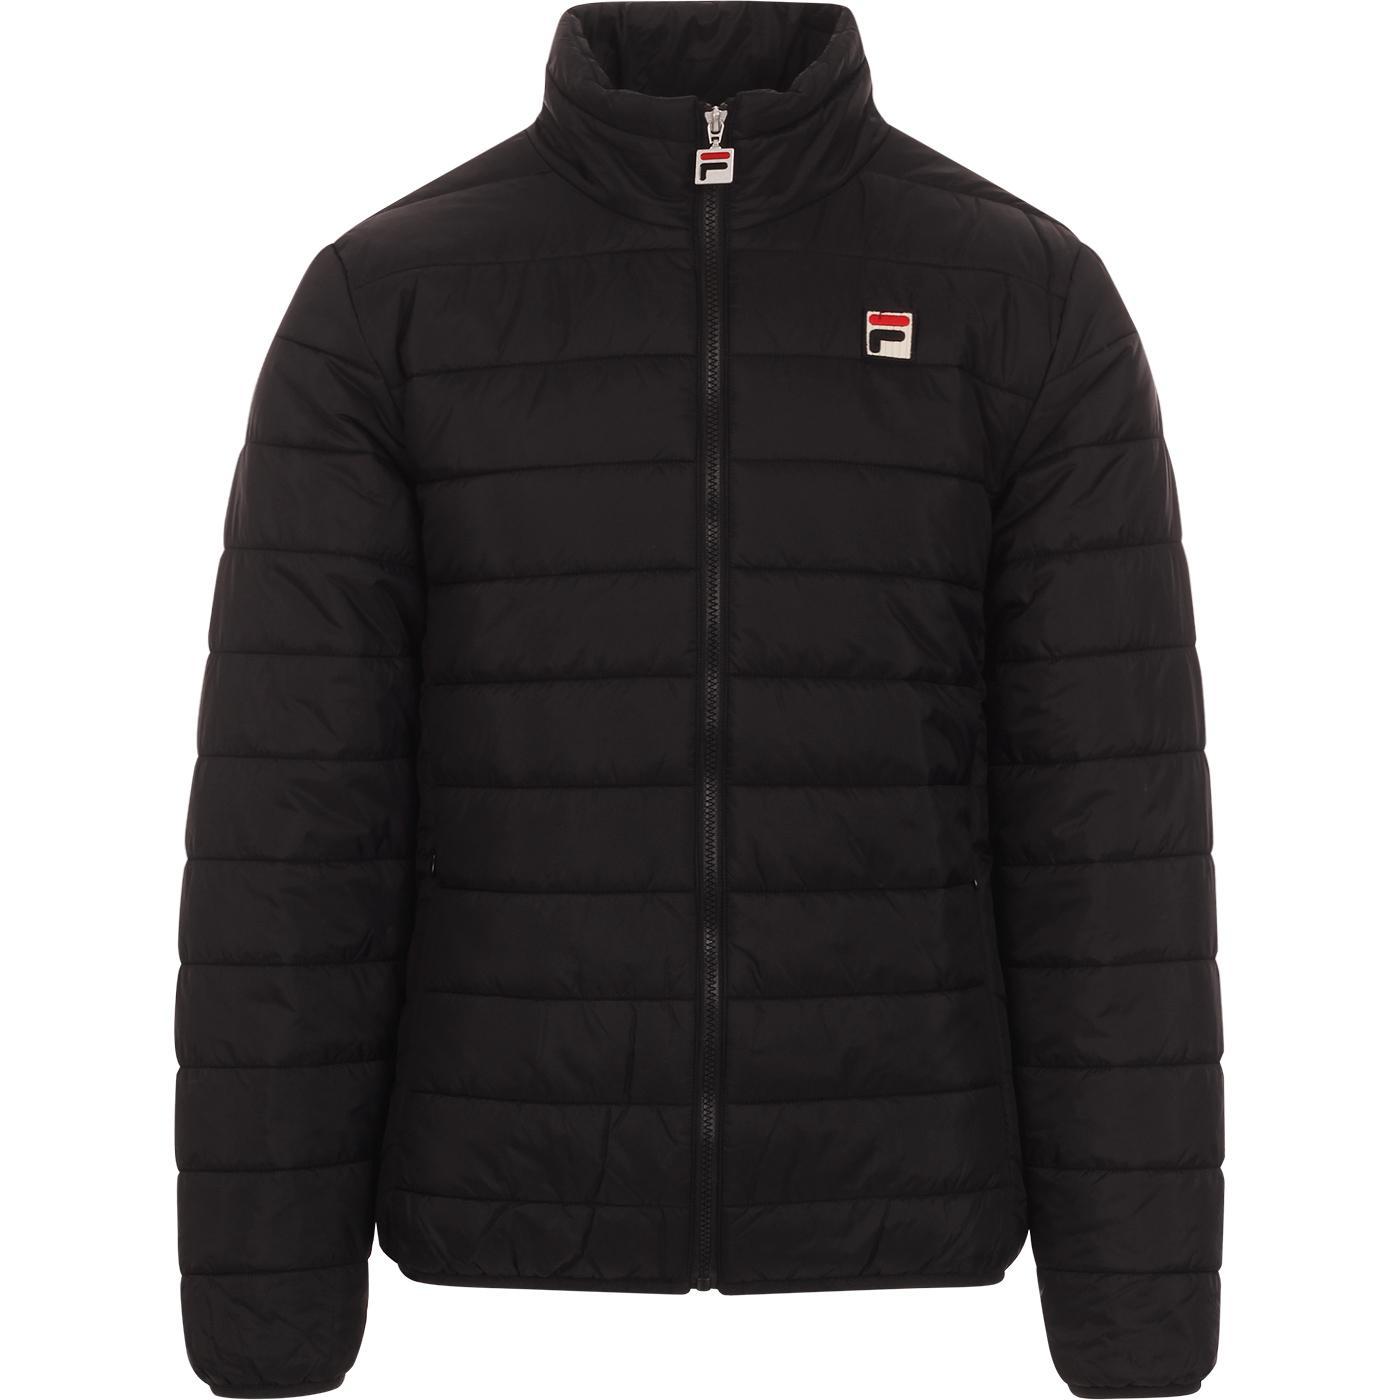 Skip FILA VINTAGE Retro 80s Puffer Jacket BLACK